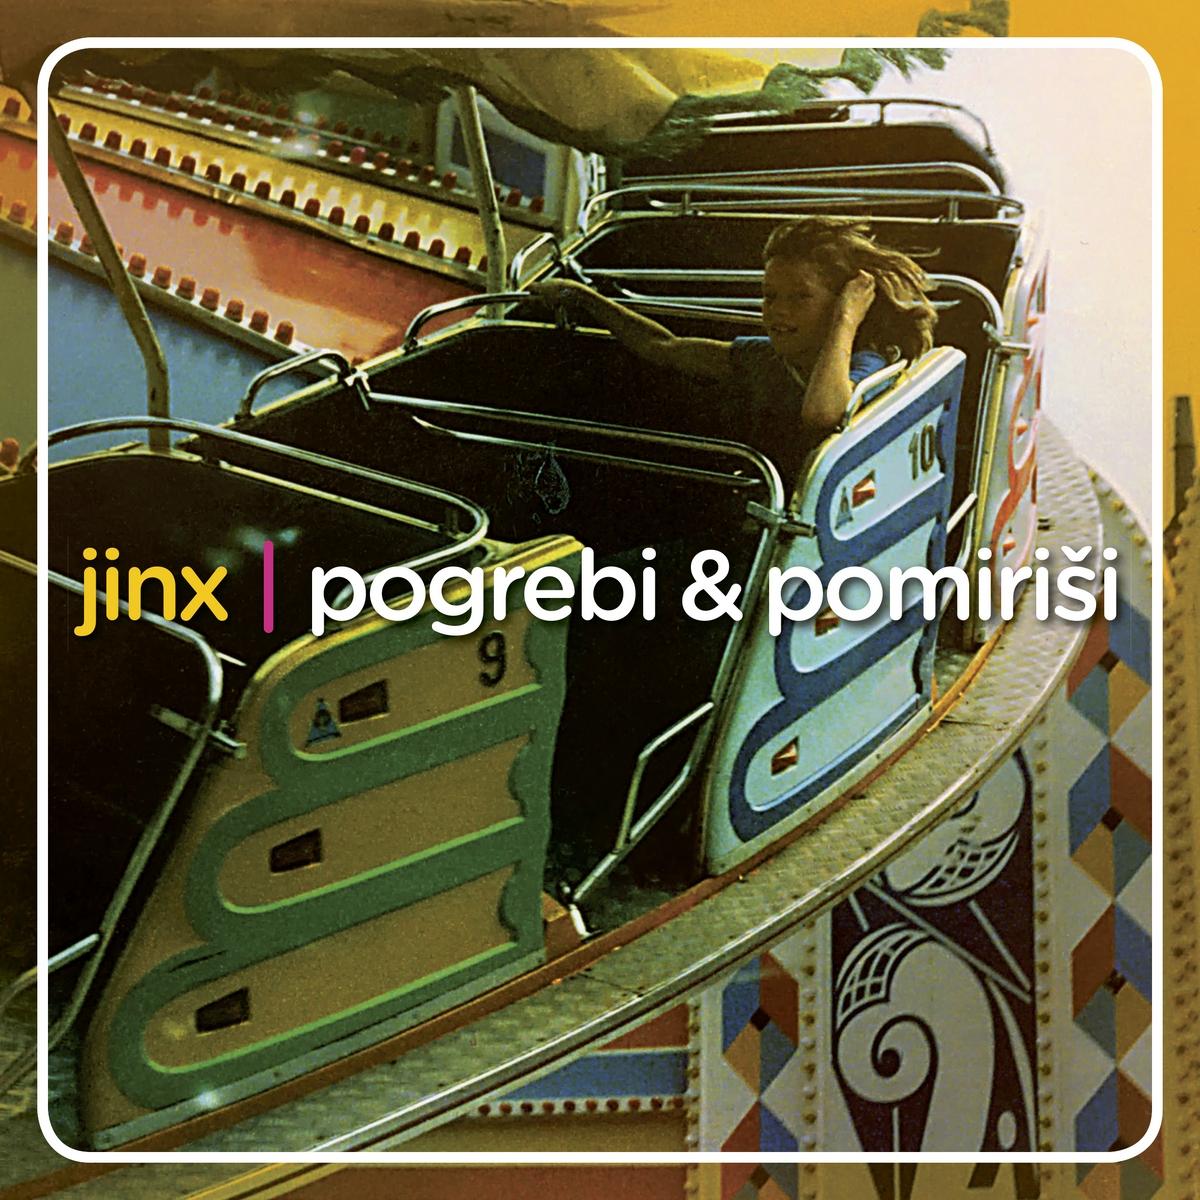 CD jinx PiP booklet final.indd